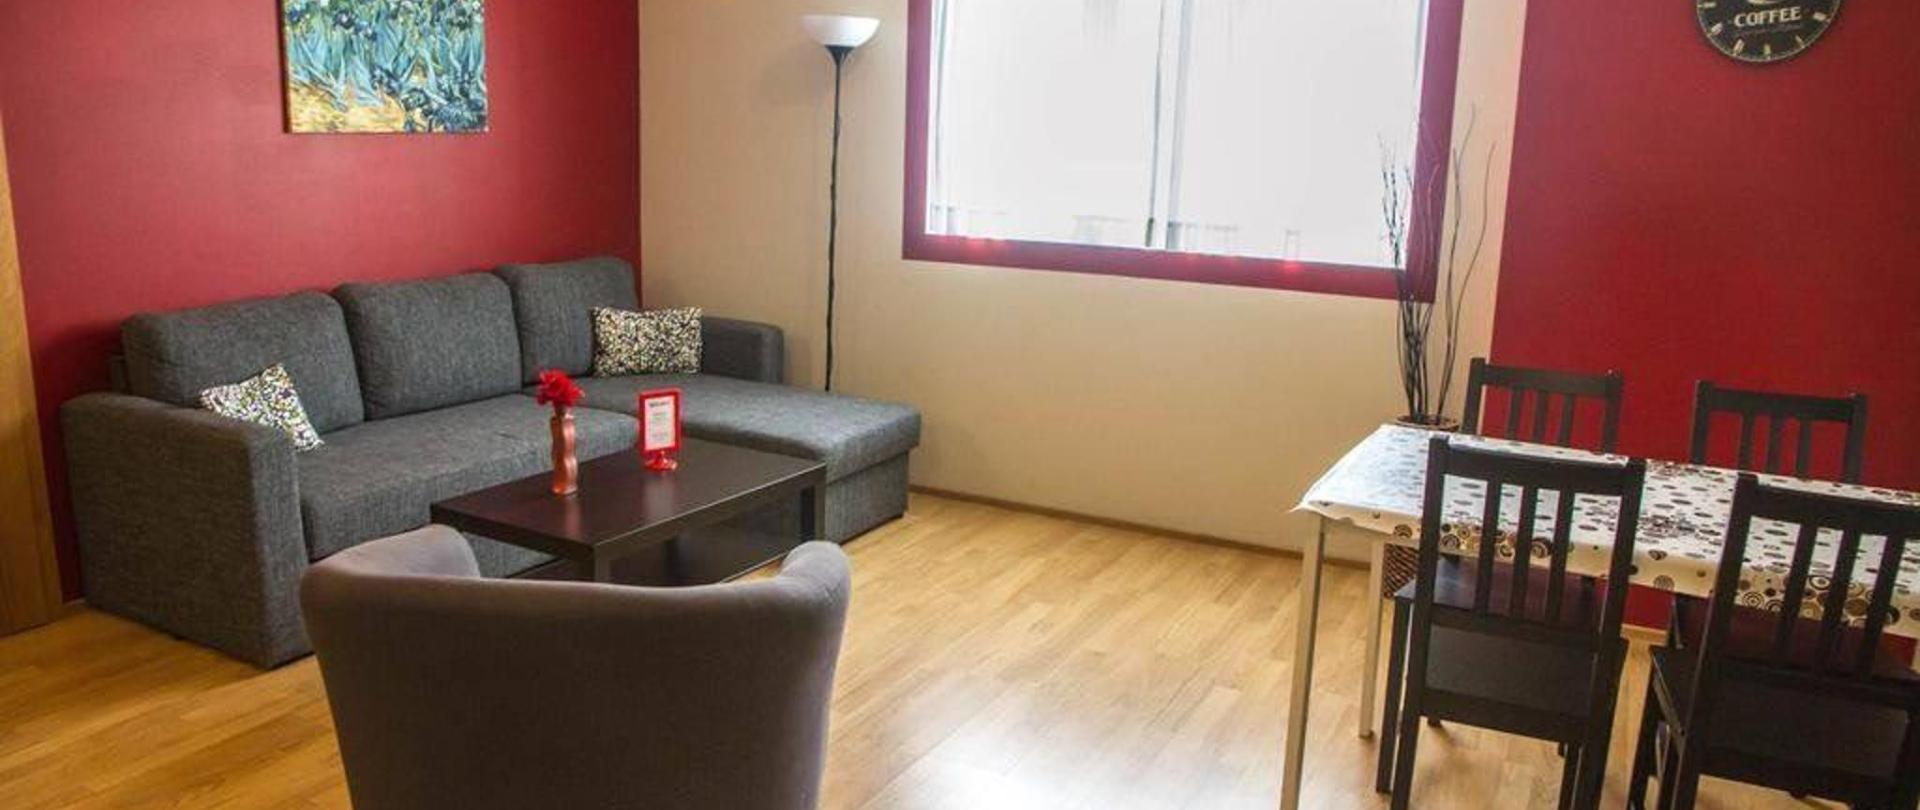 grundarfjordur-guesthouse-and-apartments-homepage-1.jpg